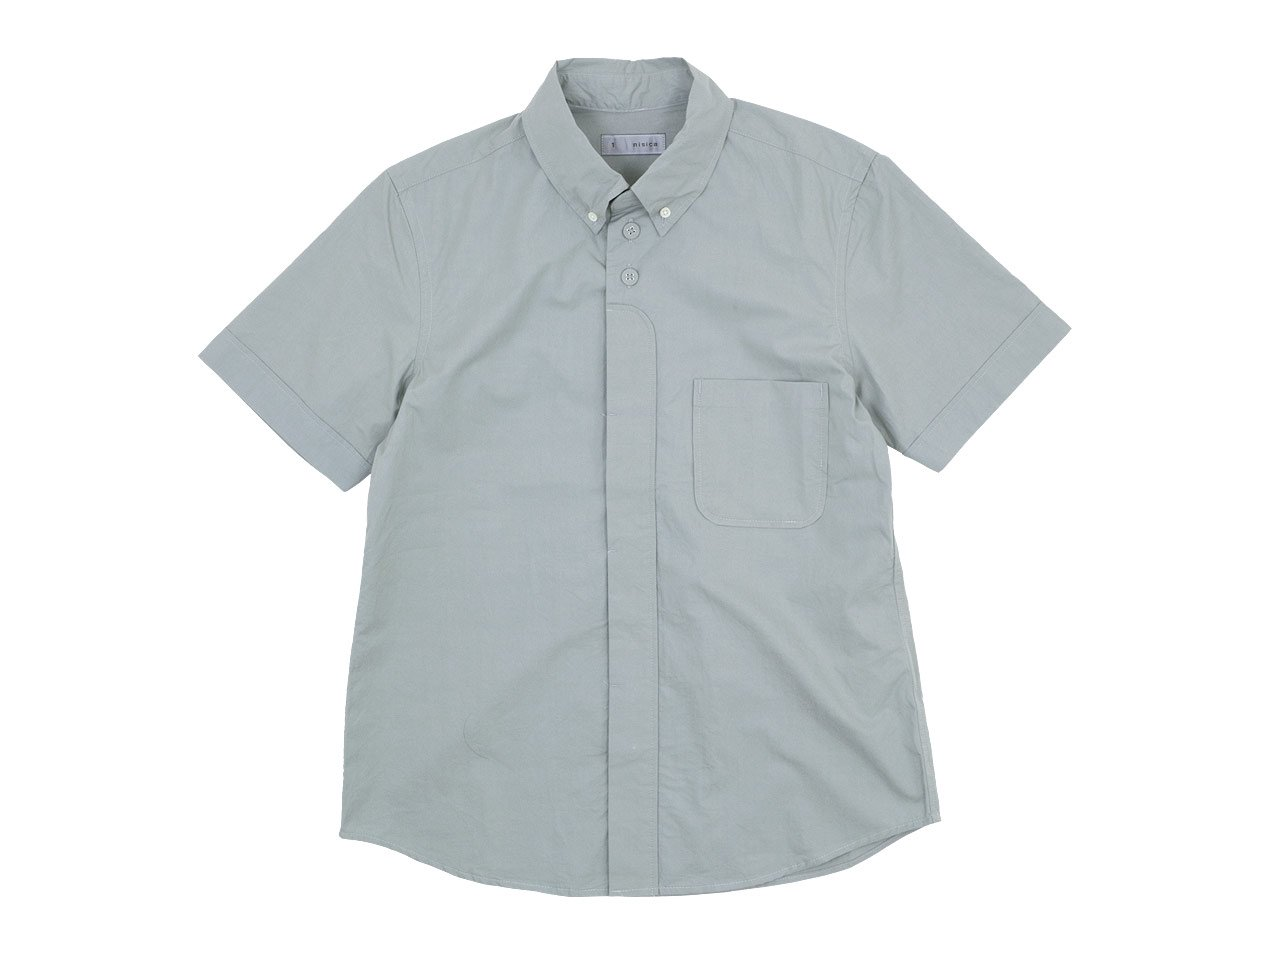 nisica ボタンダウンシャツ 半袖 GRAY